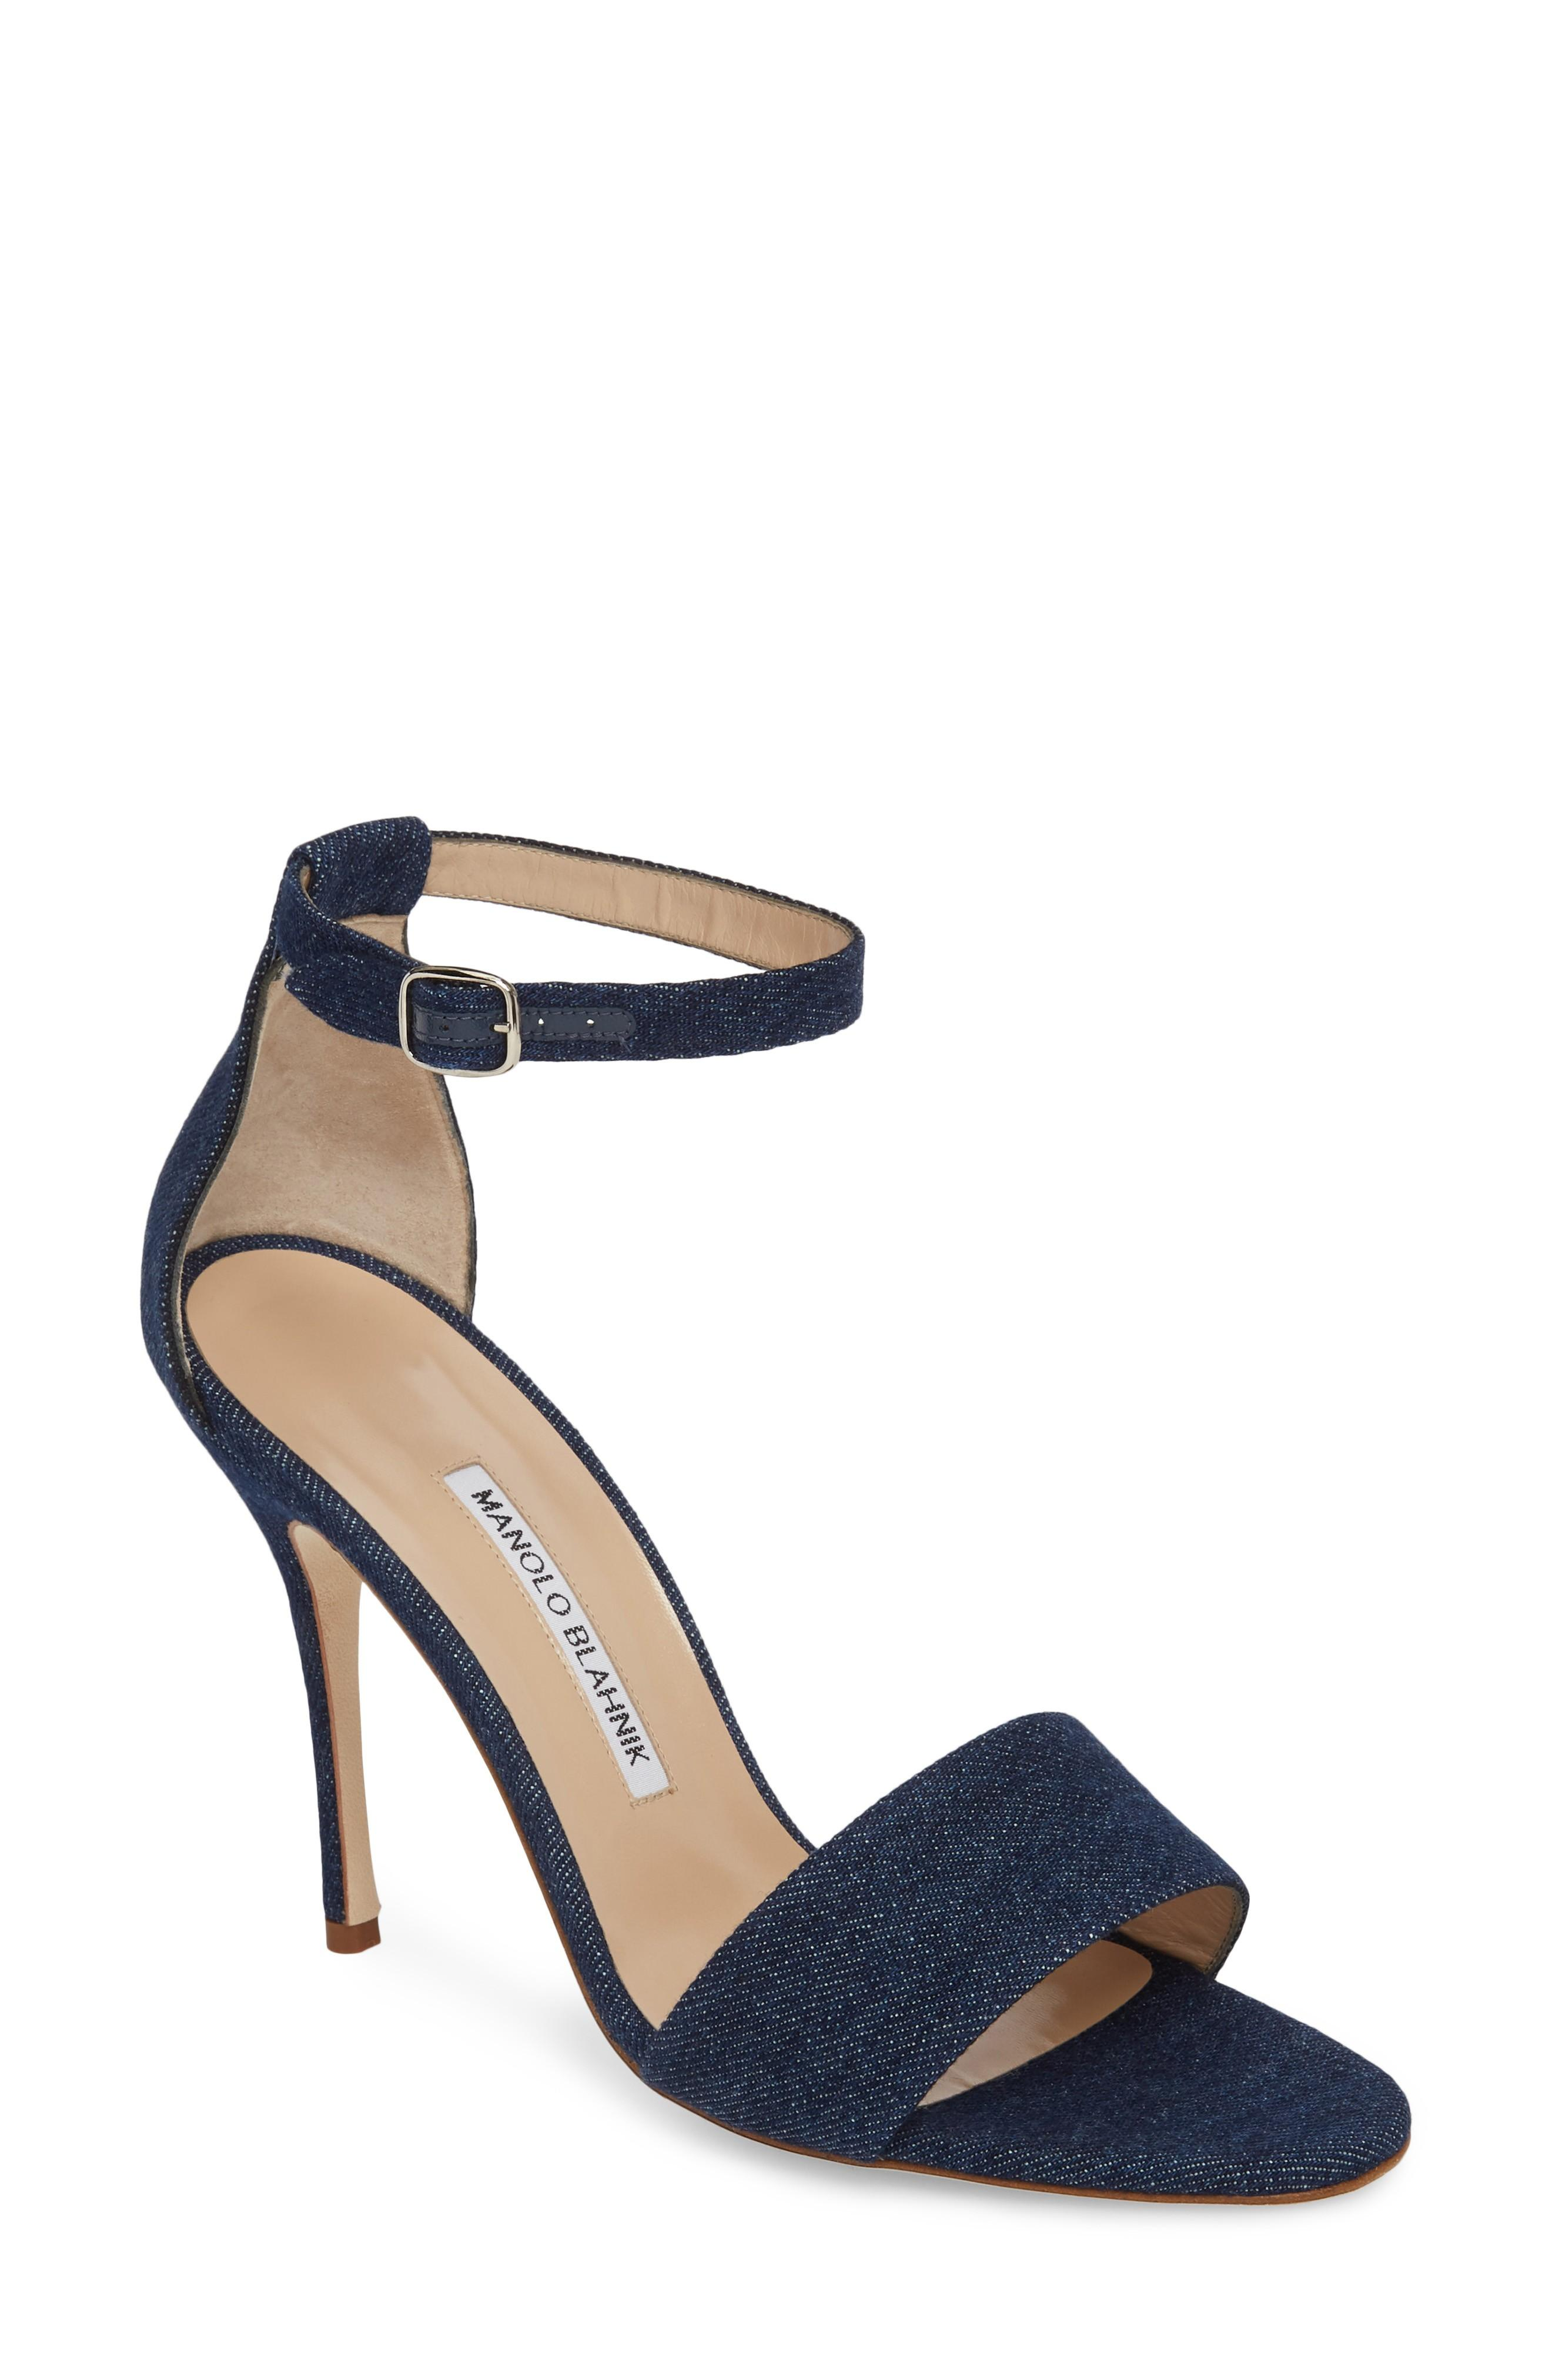 Manolo Blahnik Tres Ankle Strap Sandal In Denim Blue